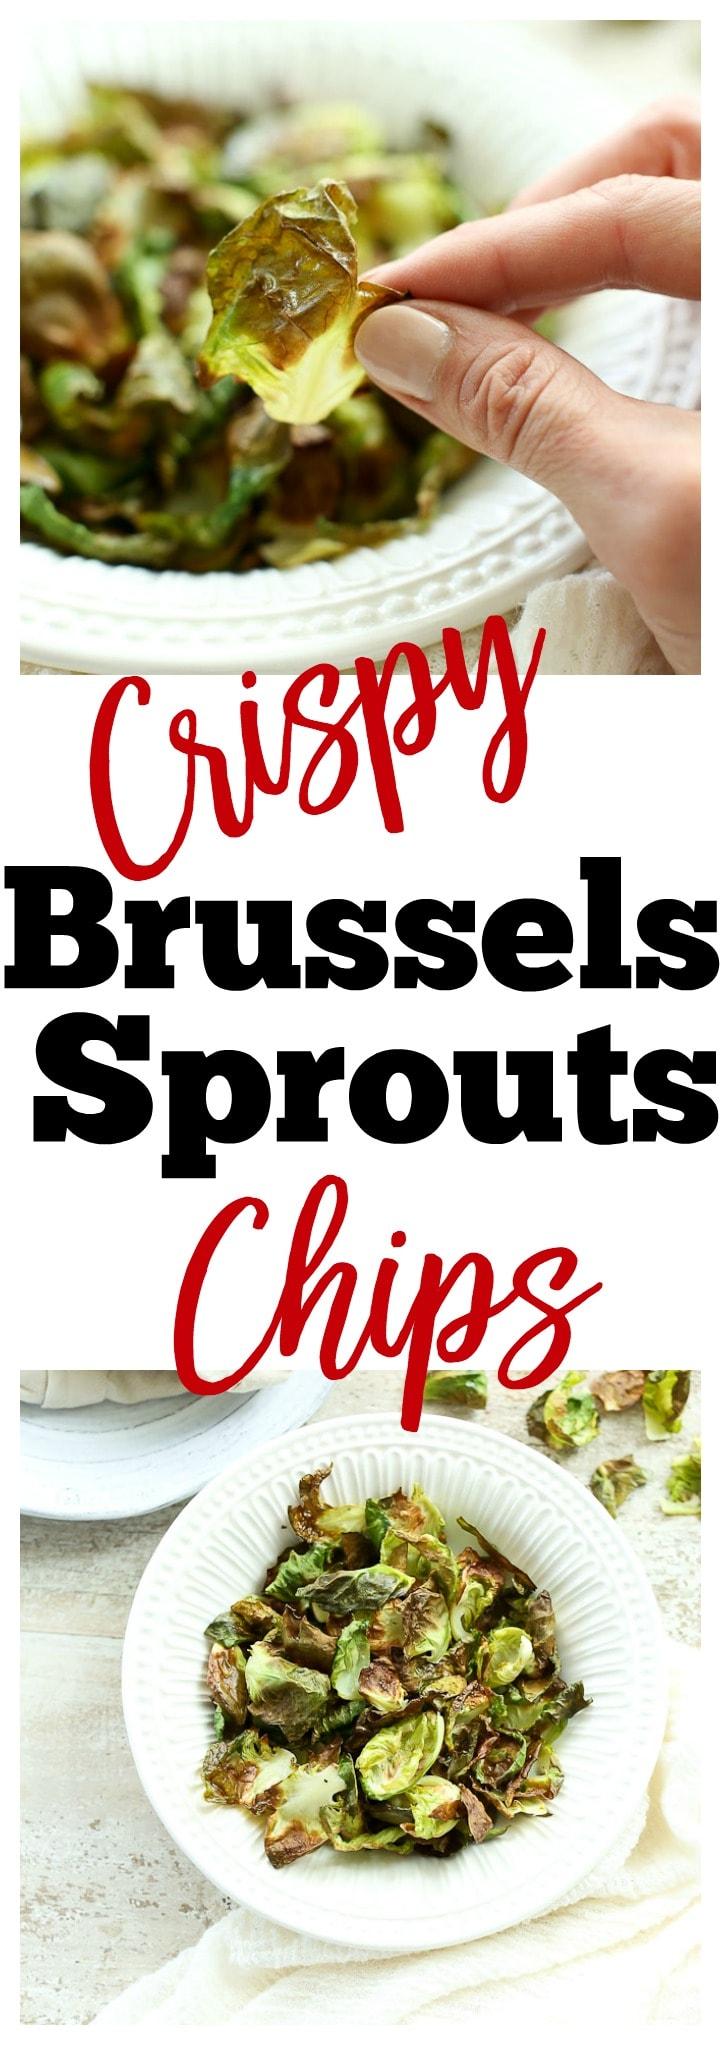 Crispy Brussels Sprouts Recipe. Gluten-free vegan healthy easy dinner side dish vegetables